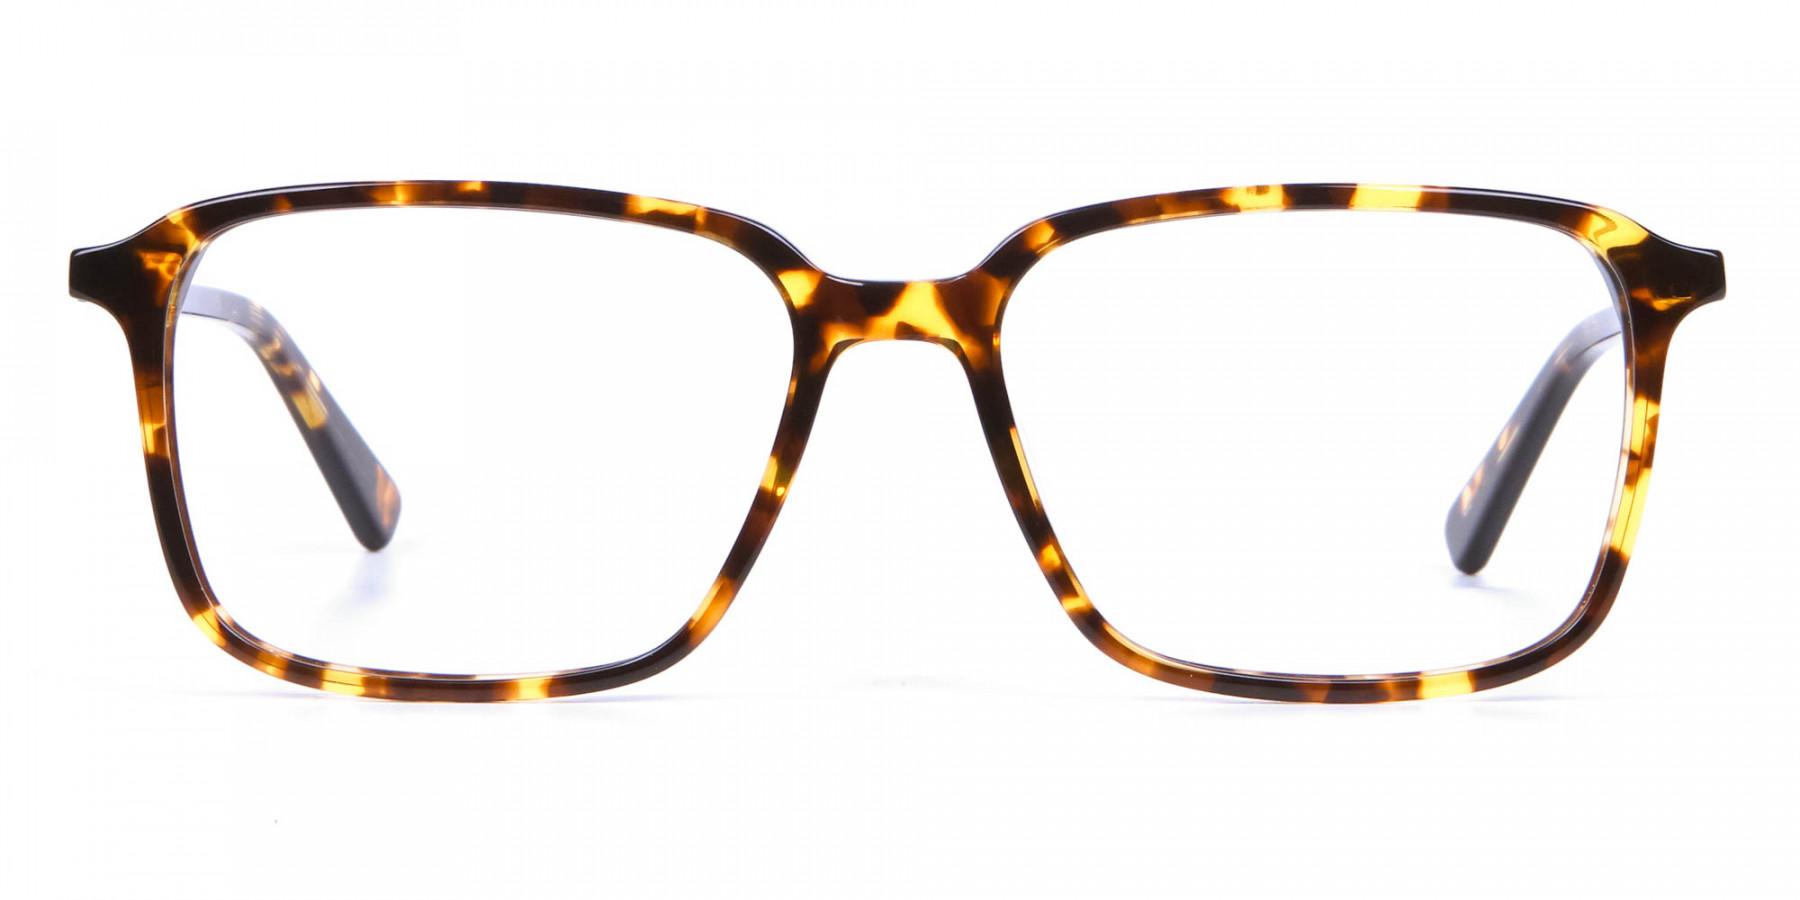 Havana & Tortoiseshell Glasses